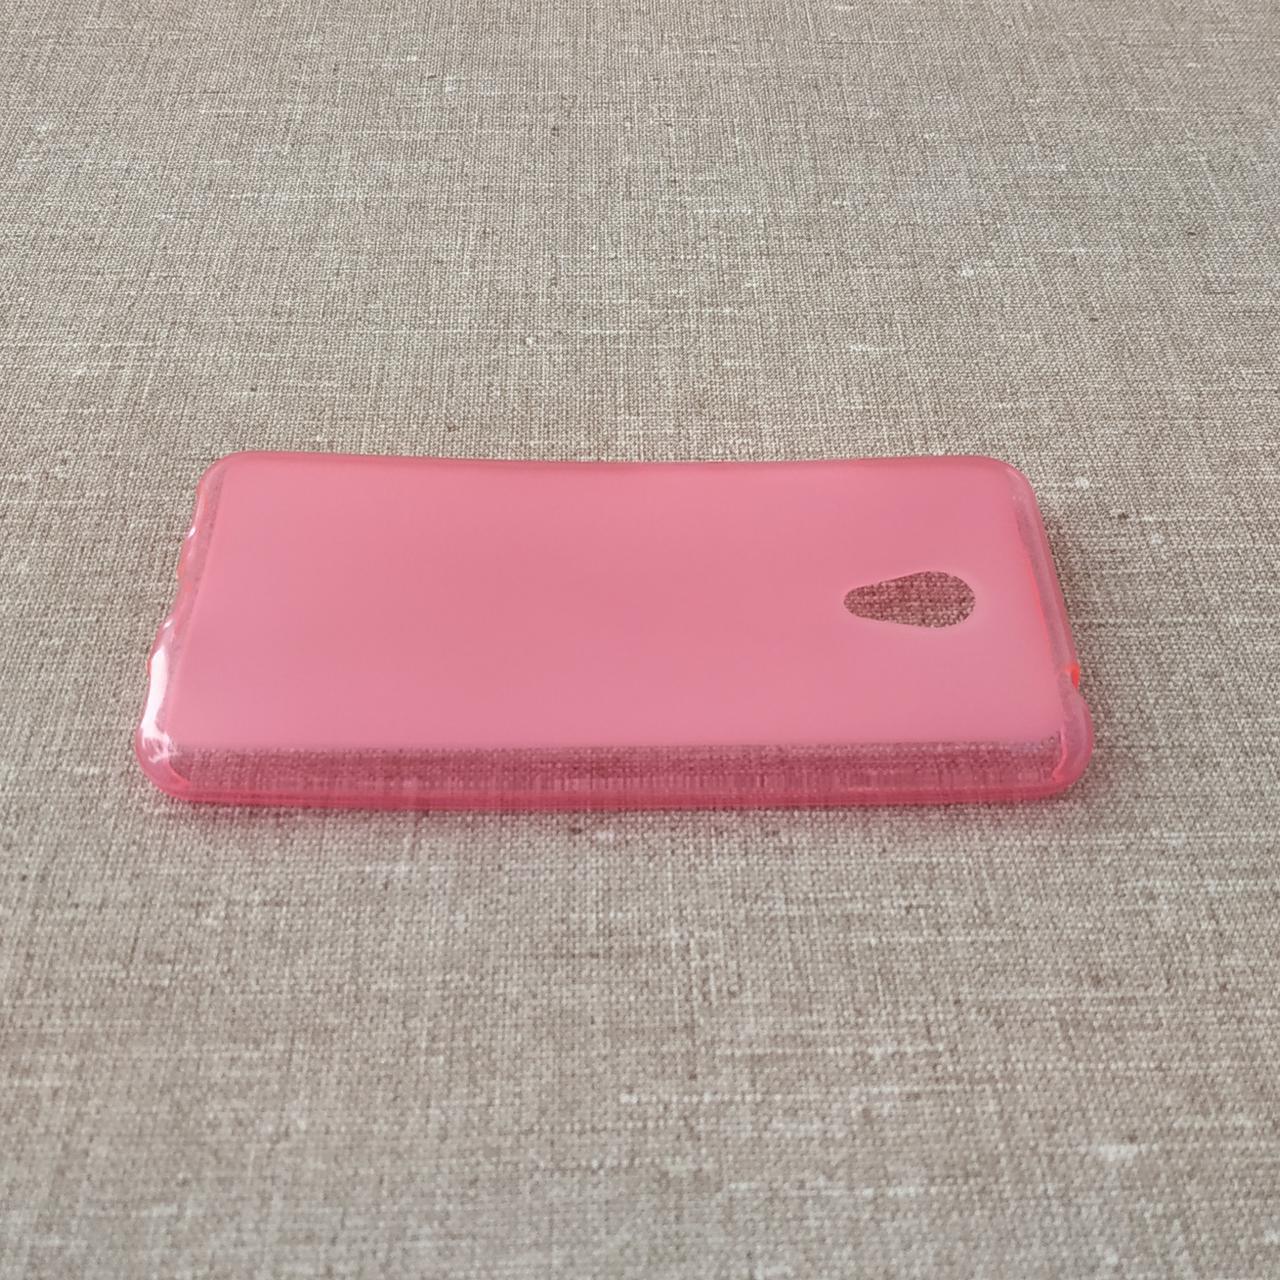 TPU Meizu M5c pink Для телефона